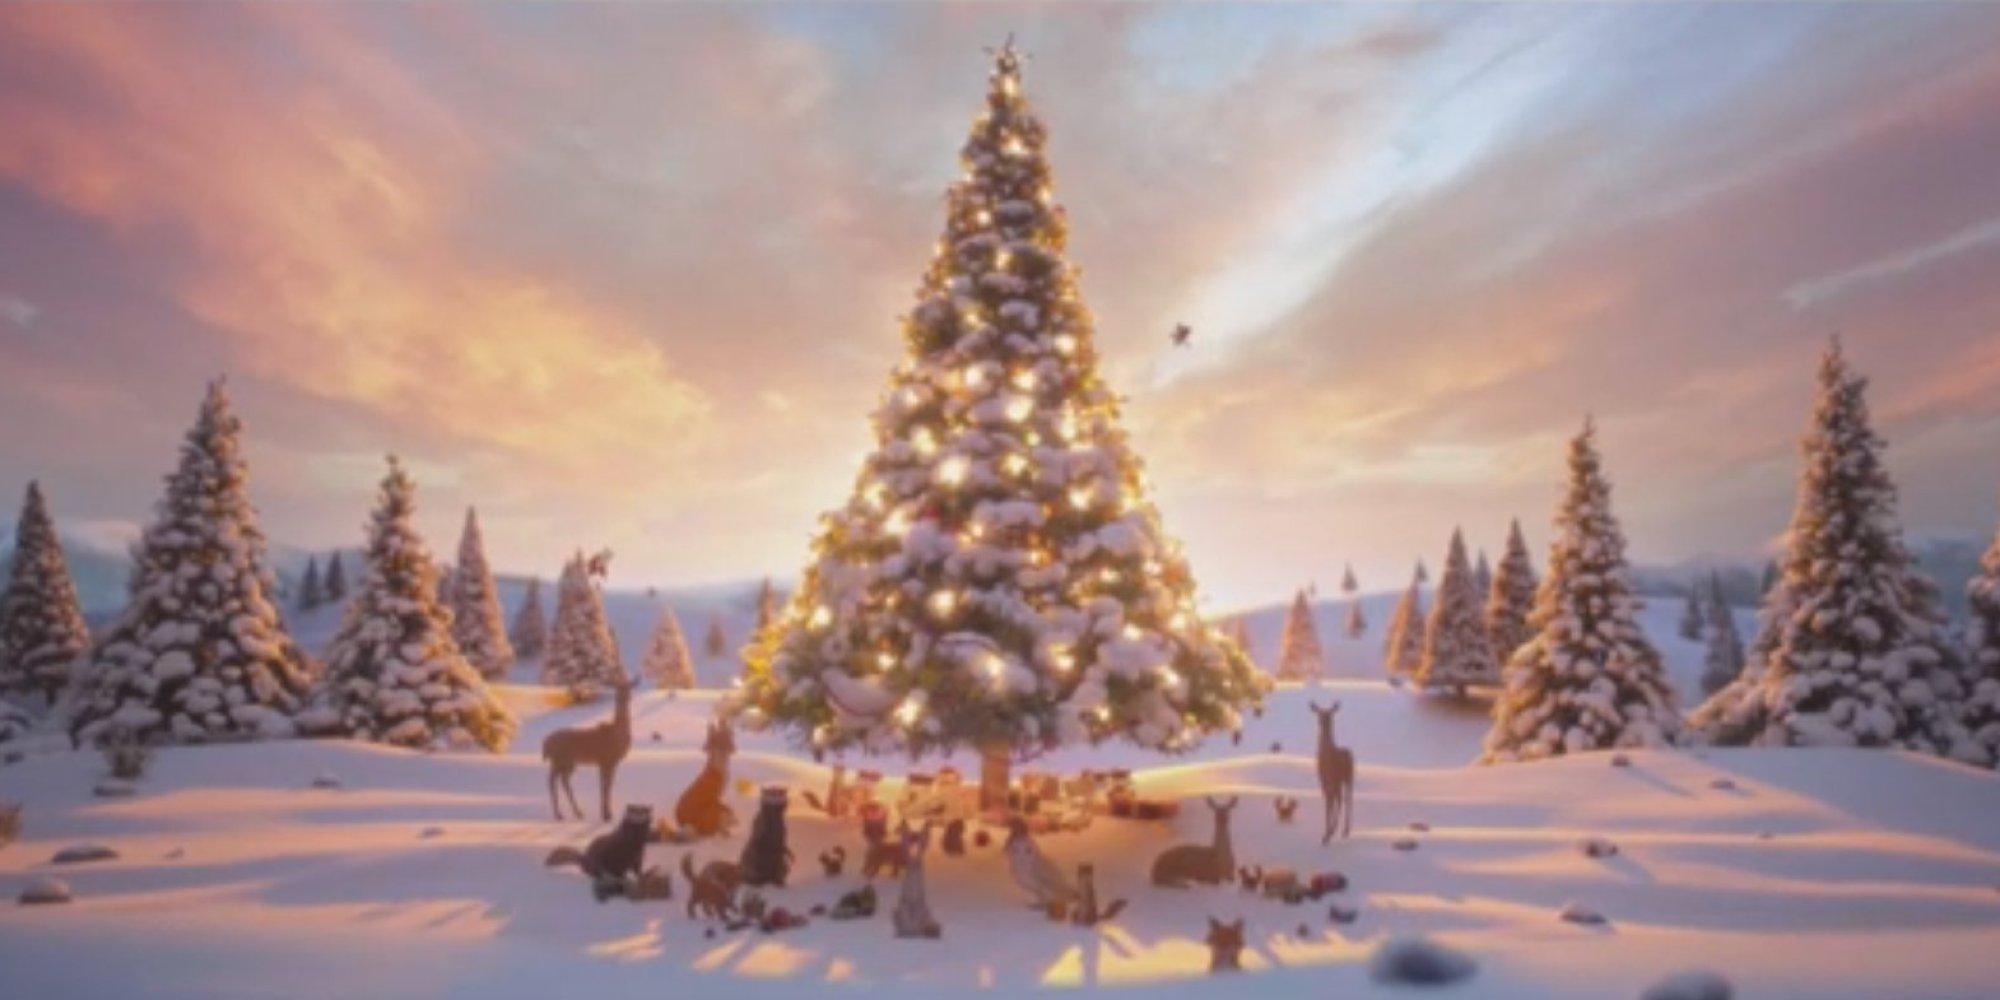 john lewis christmas adverts music